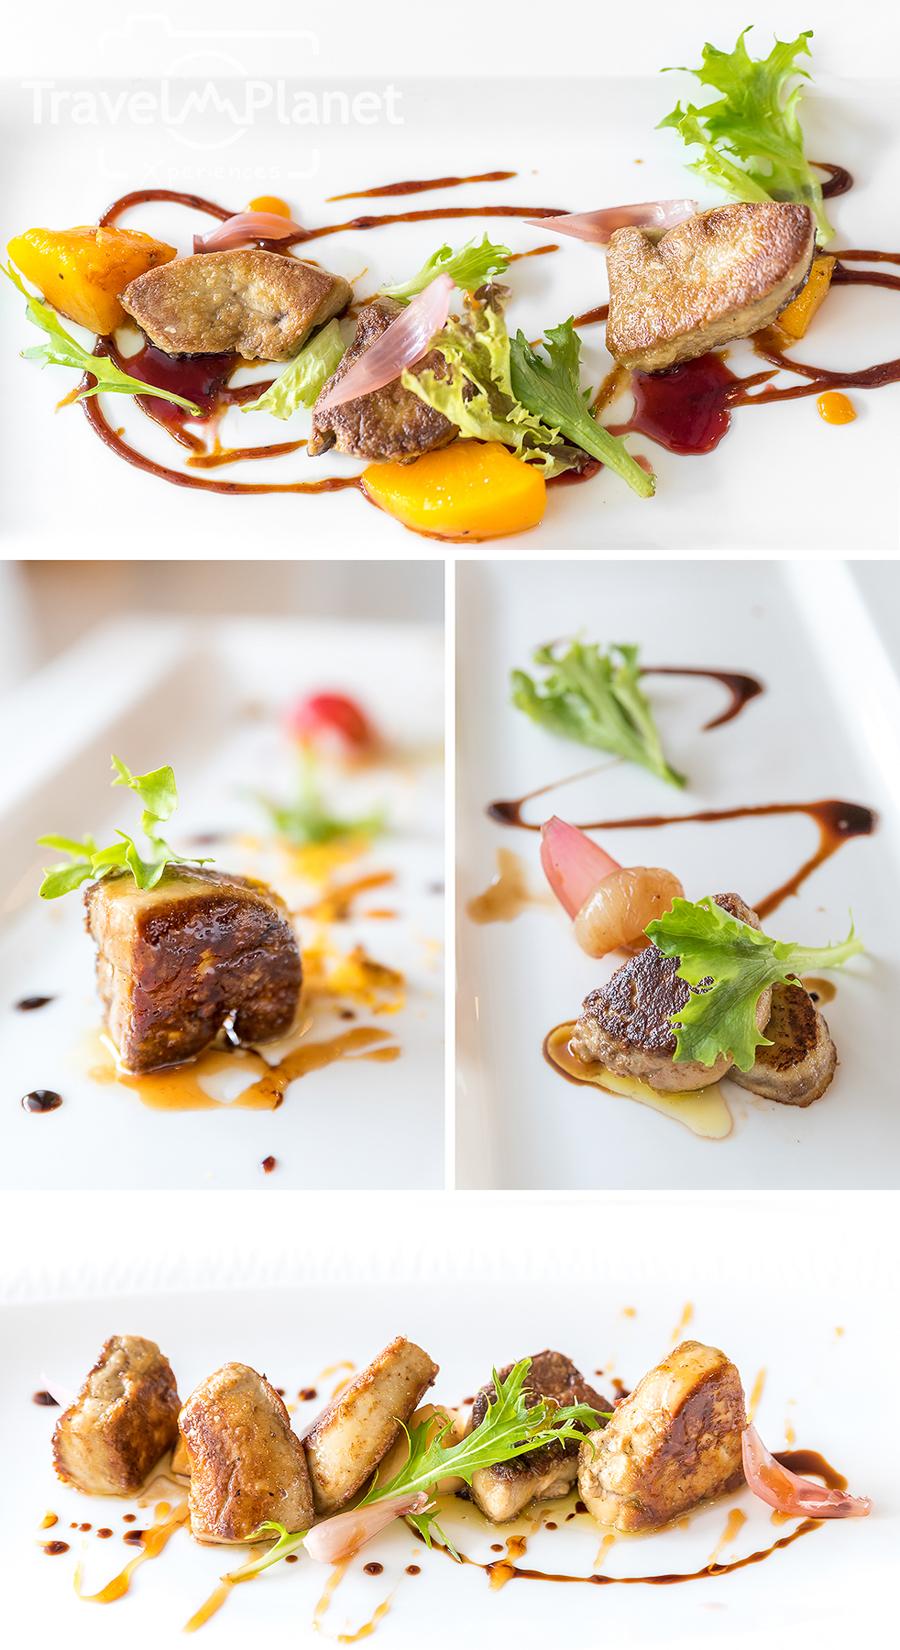 Sunday Brunch Le Meridien Suvarnabhumi - Foie gras